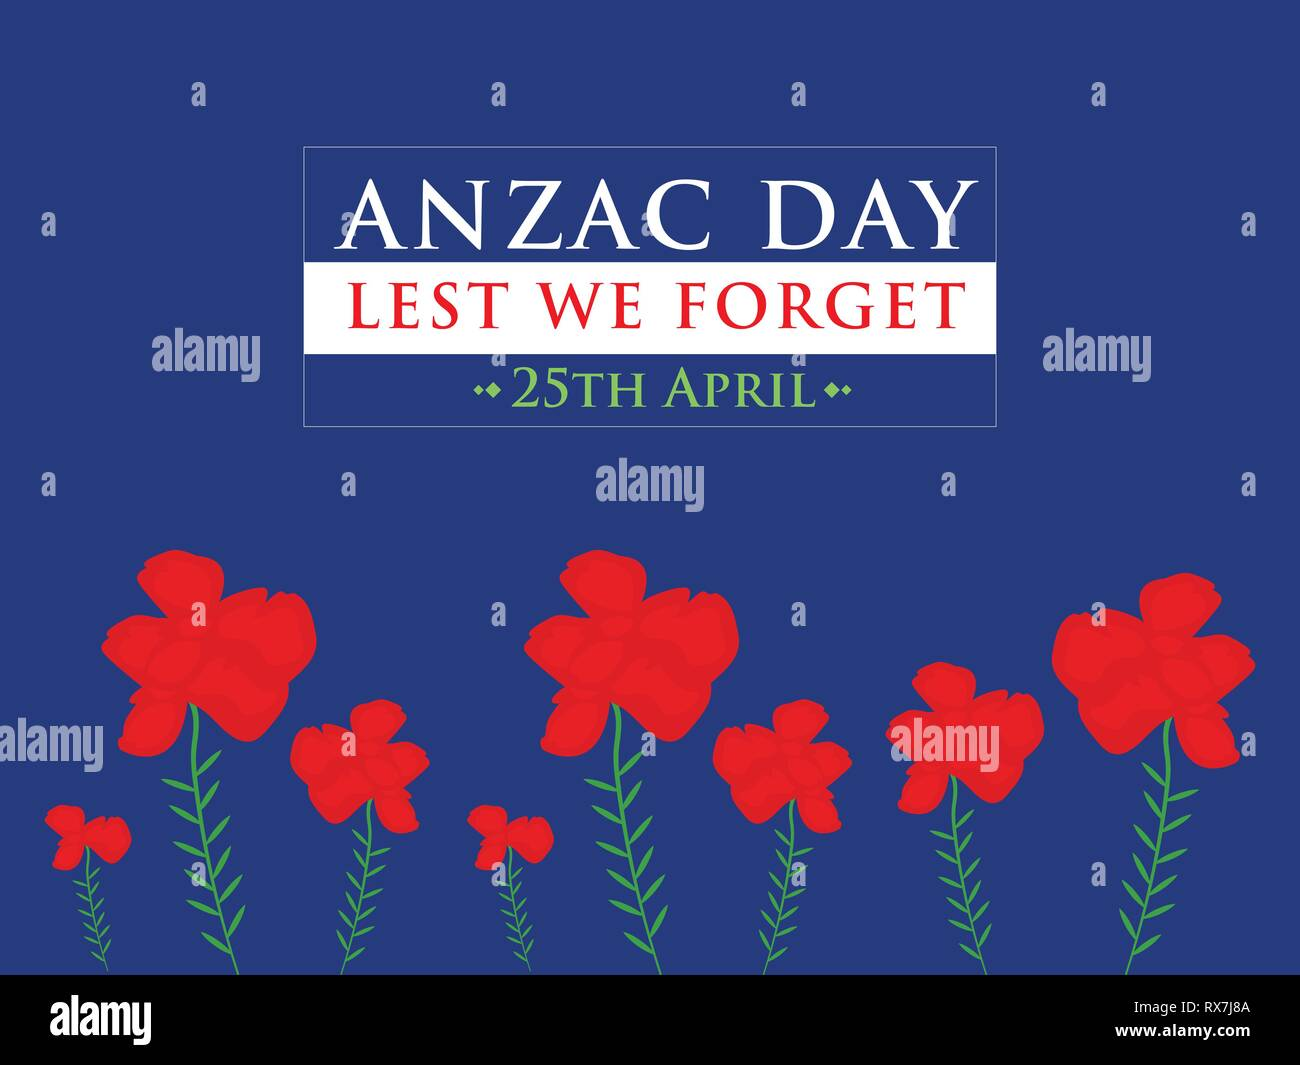 Anzac Day Australia - Stock Vector